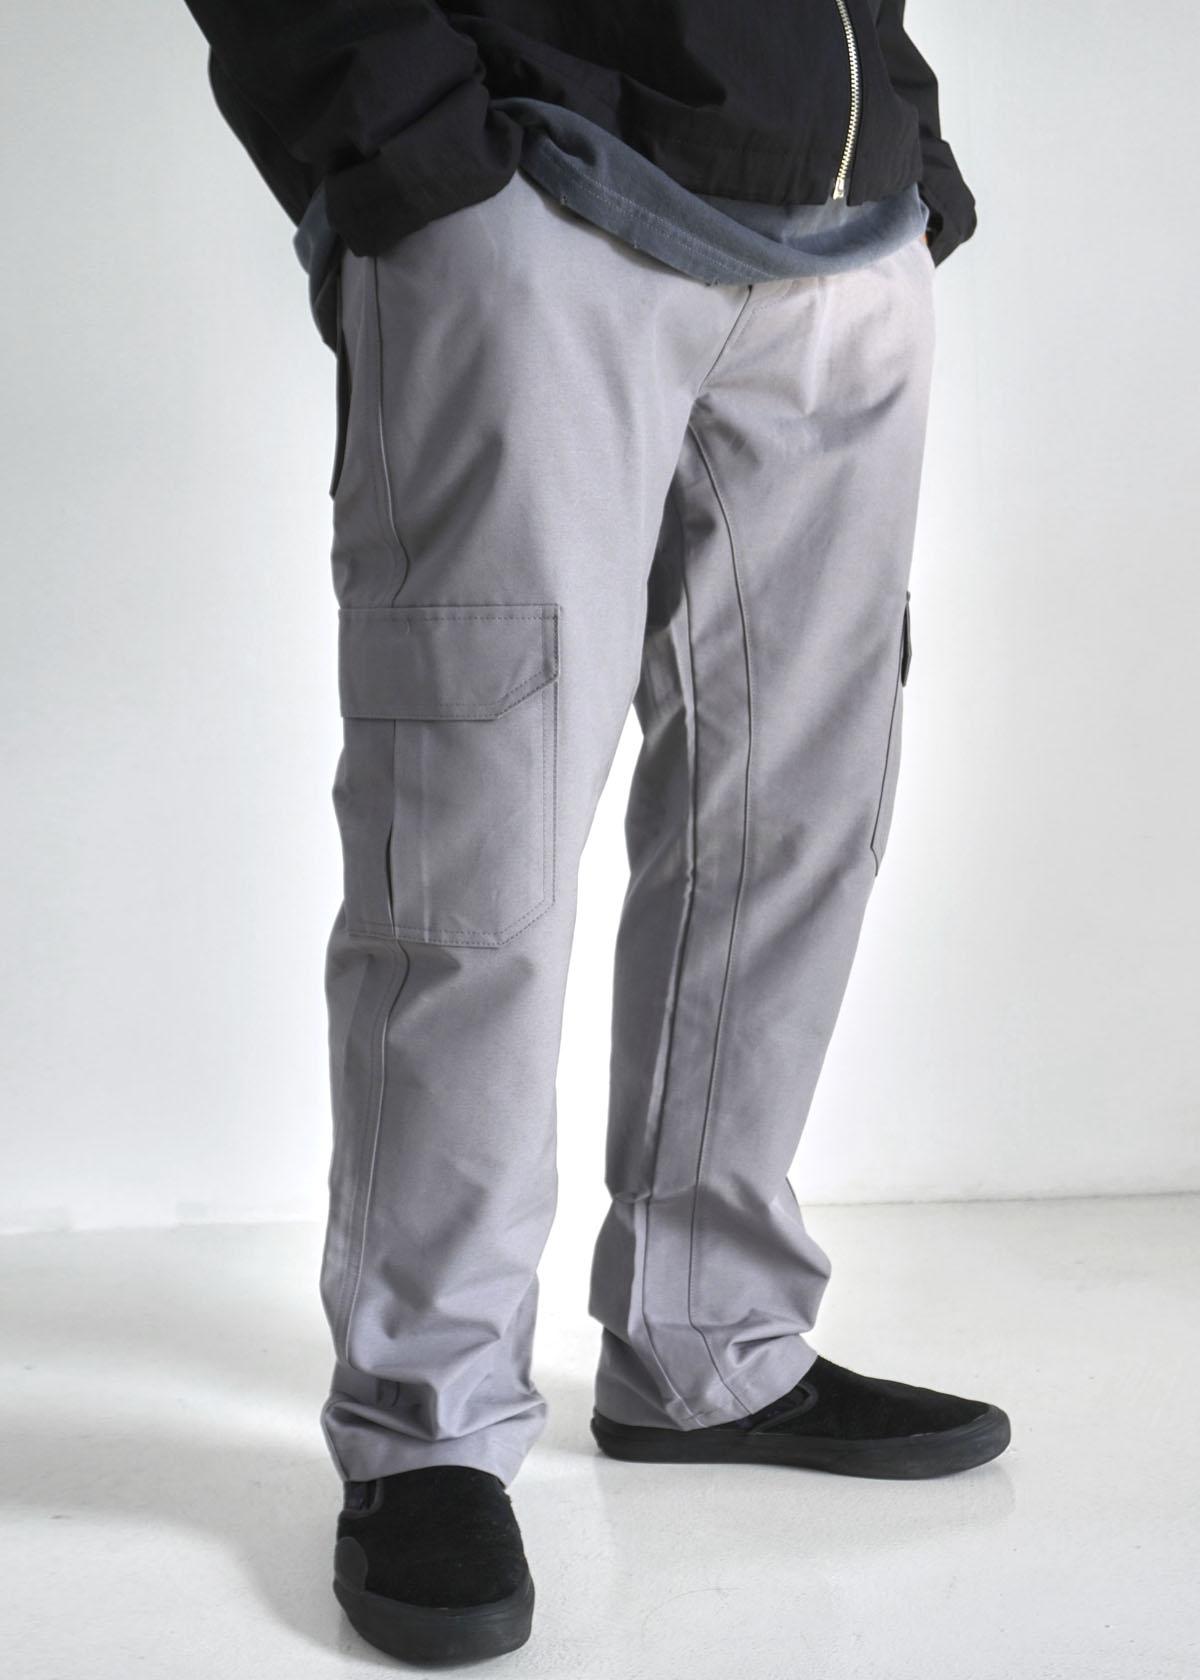 Stitch Up Banding Cargo Pants (2Color)